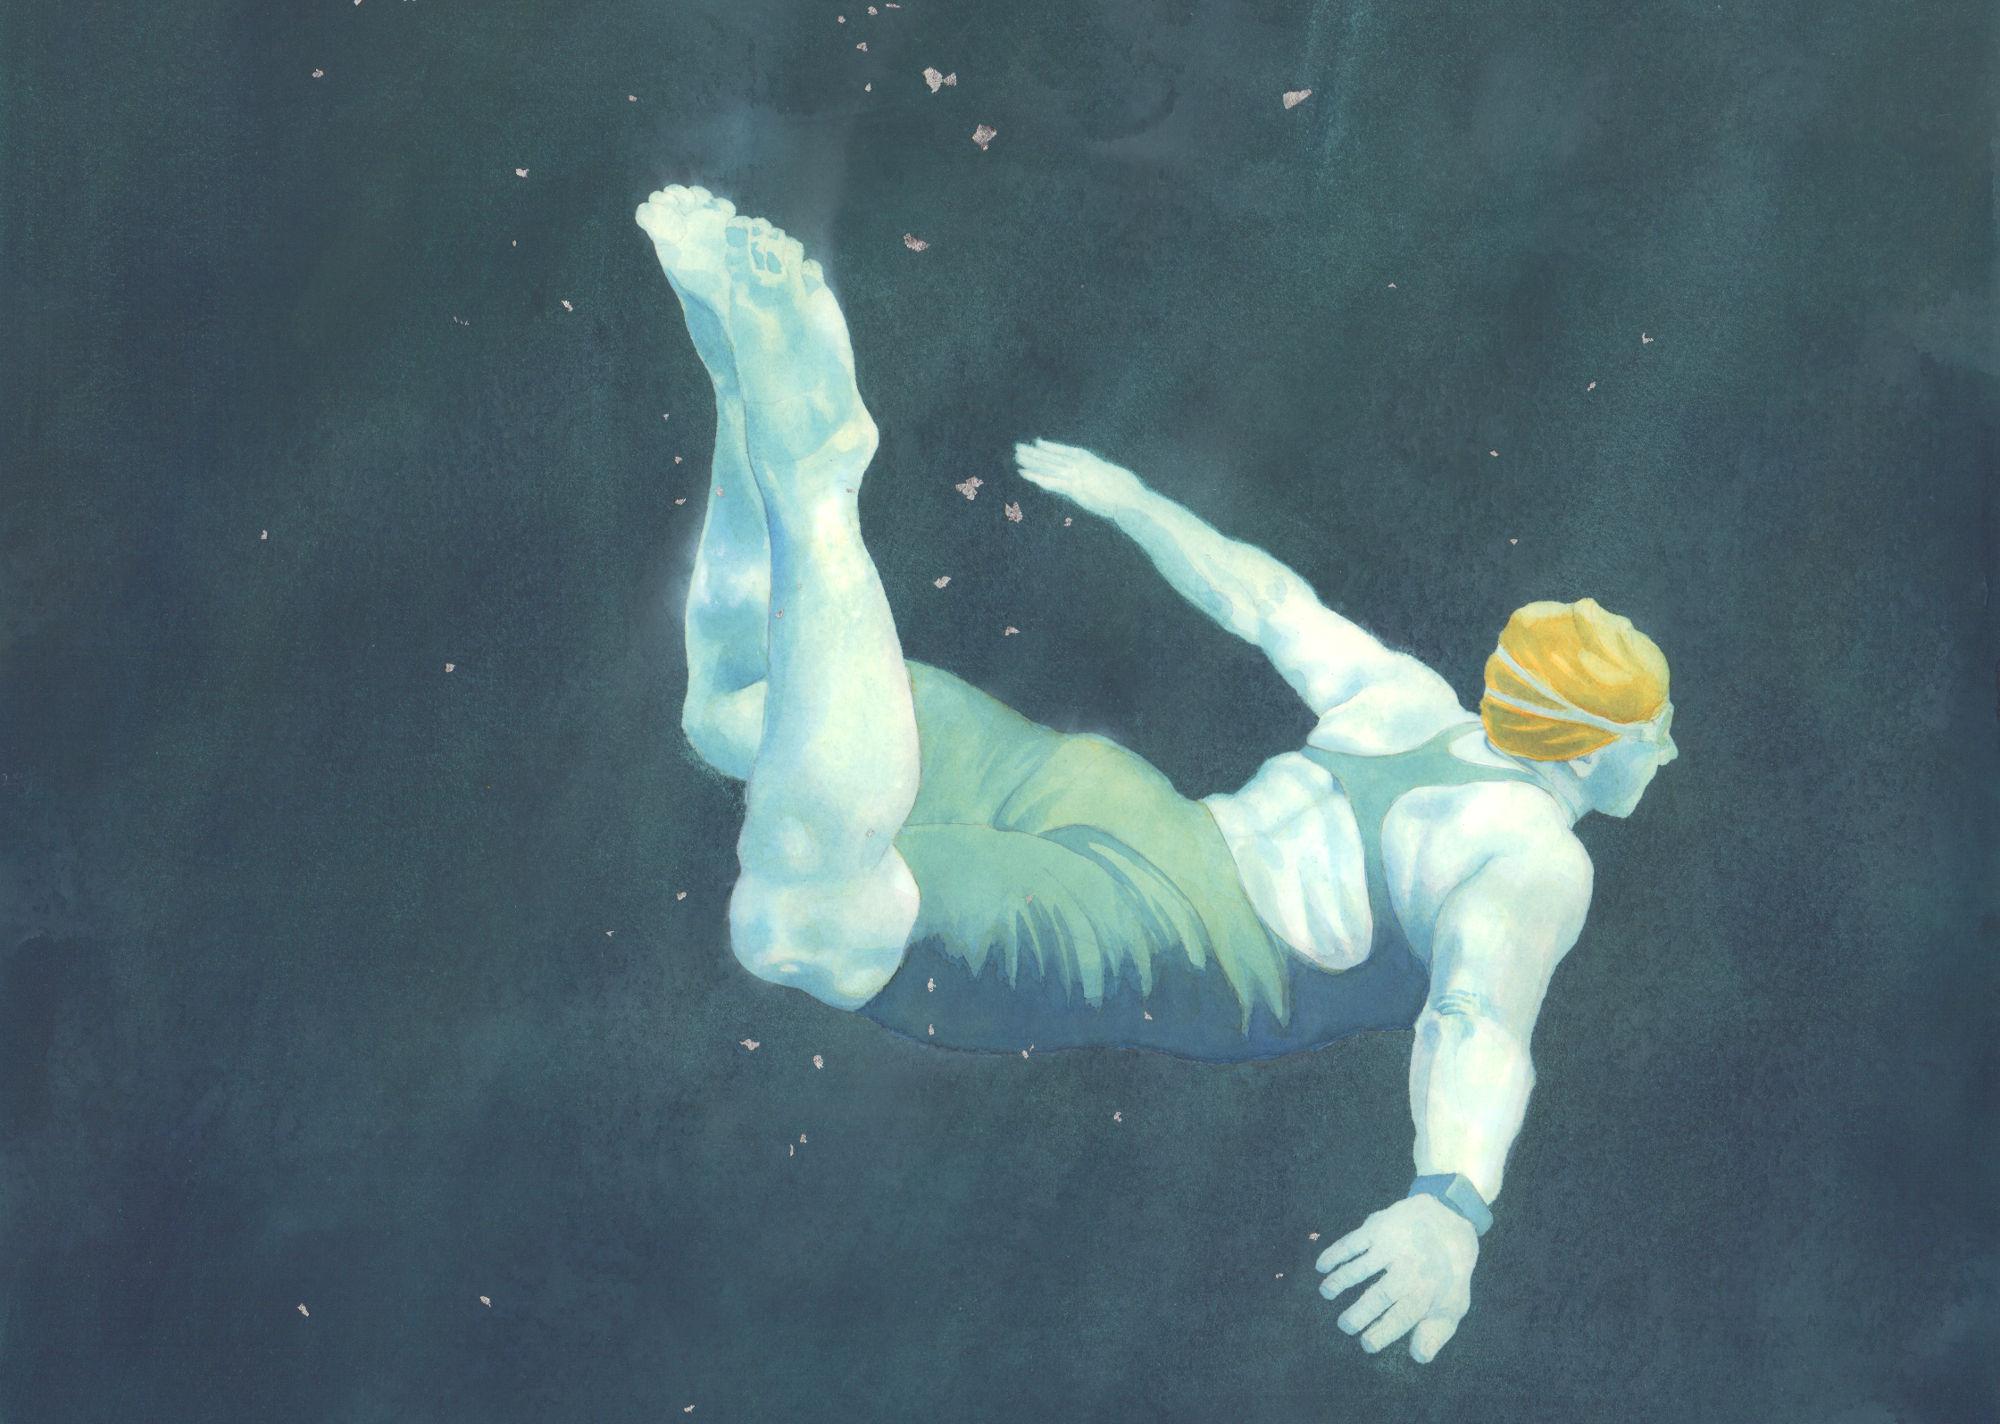 Lisa - swimmer painting in watercolour by Nancy Farmer - detail